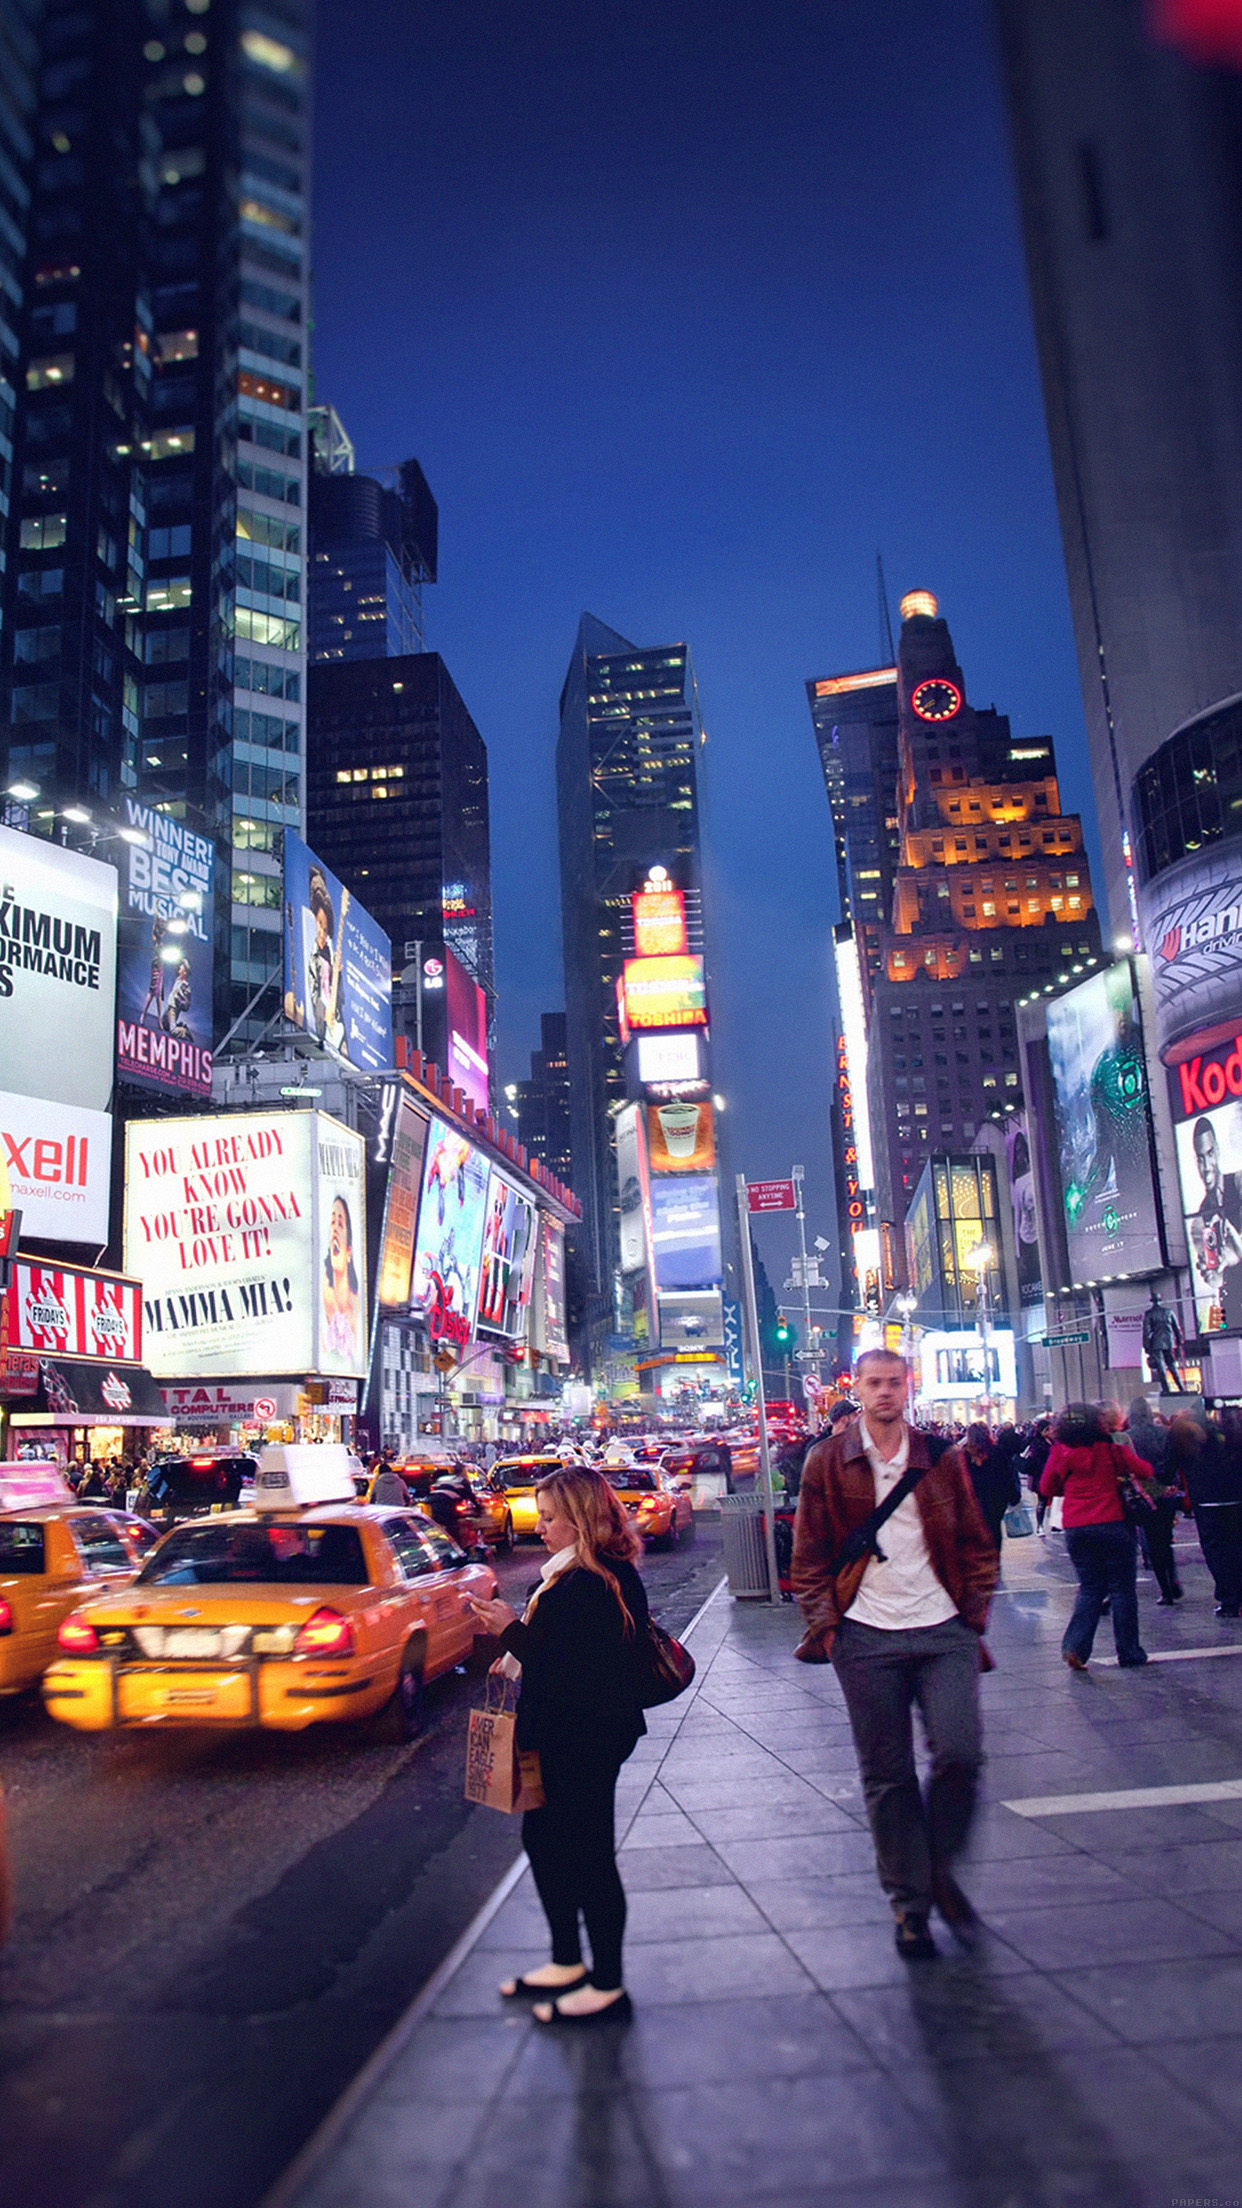 New York New York Street Night City 3Wallpapers iPhone Parallax New York Street Night City